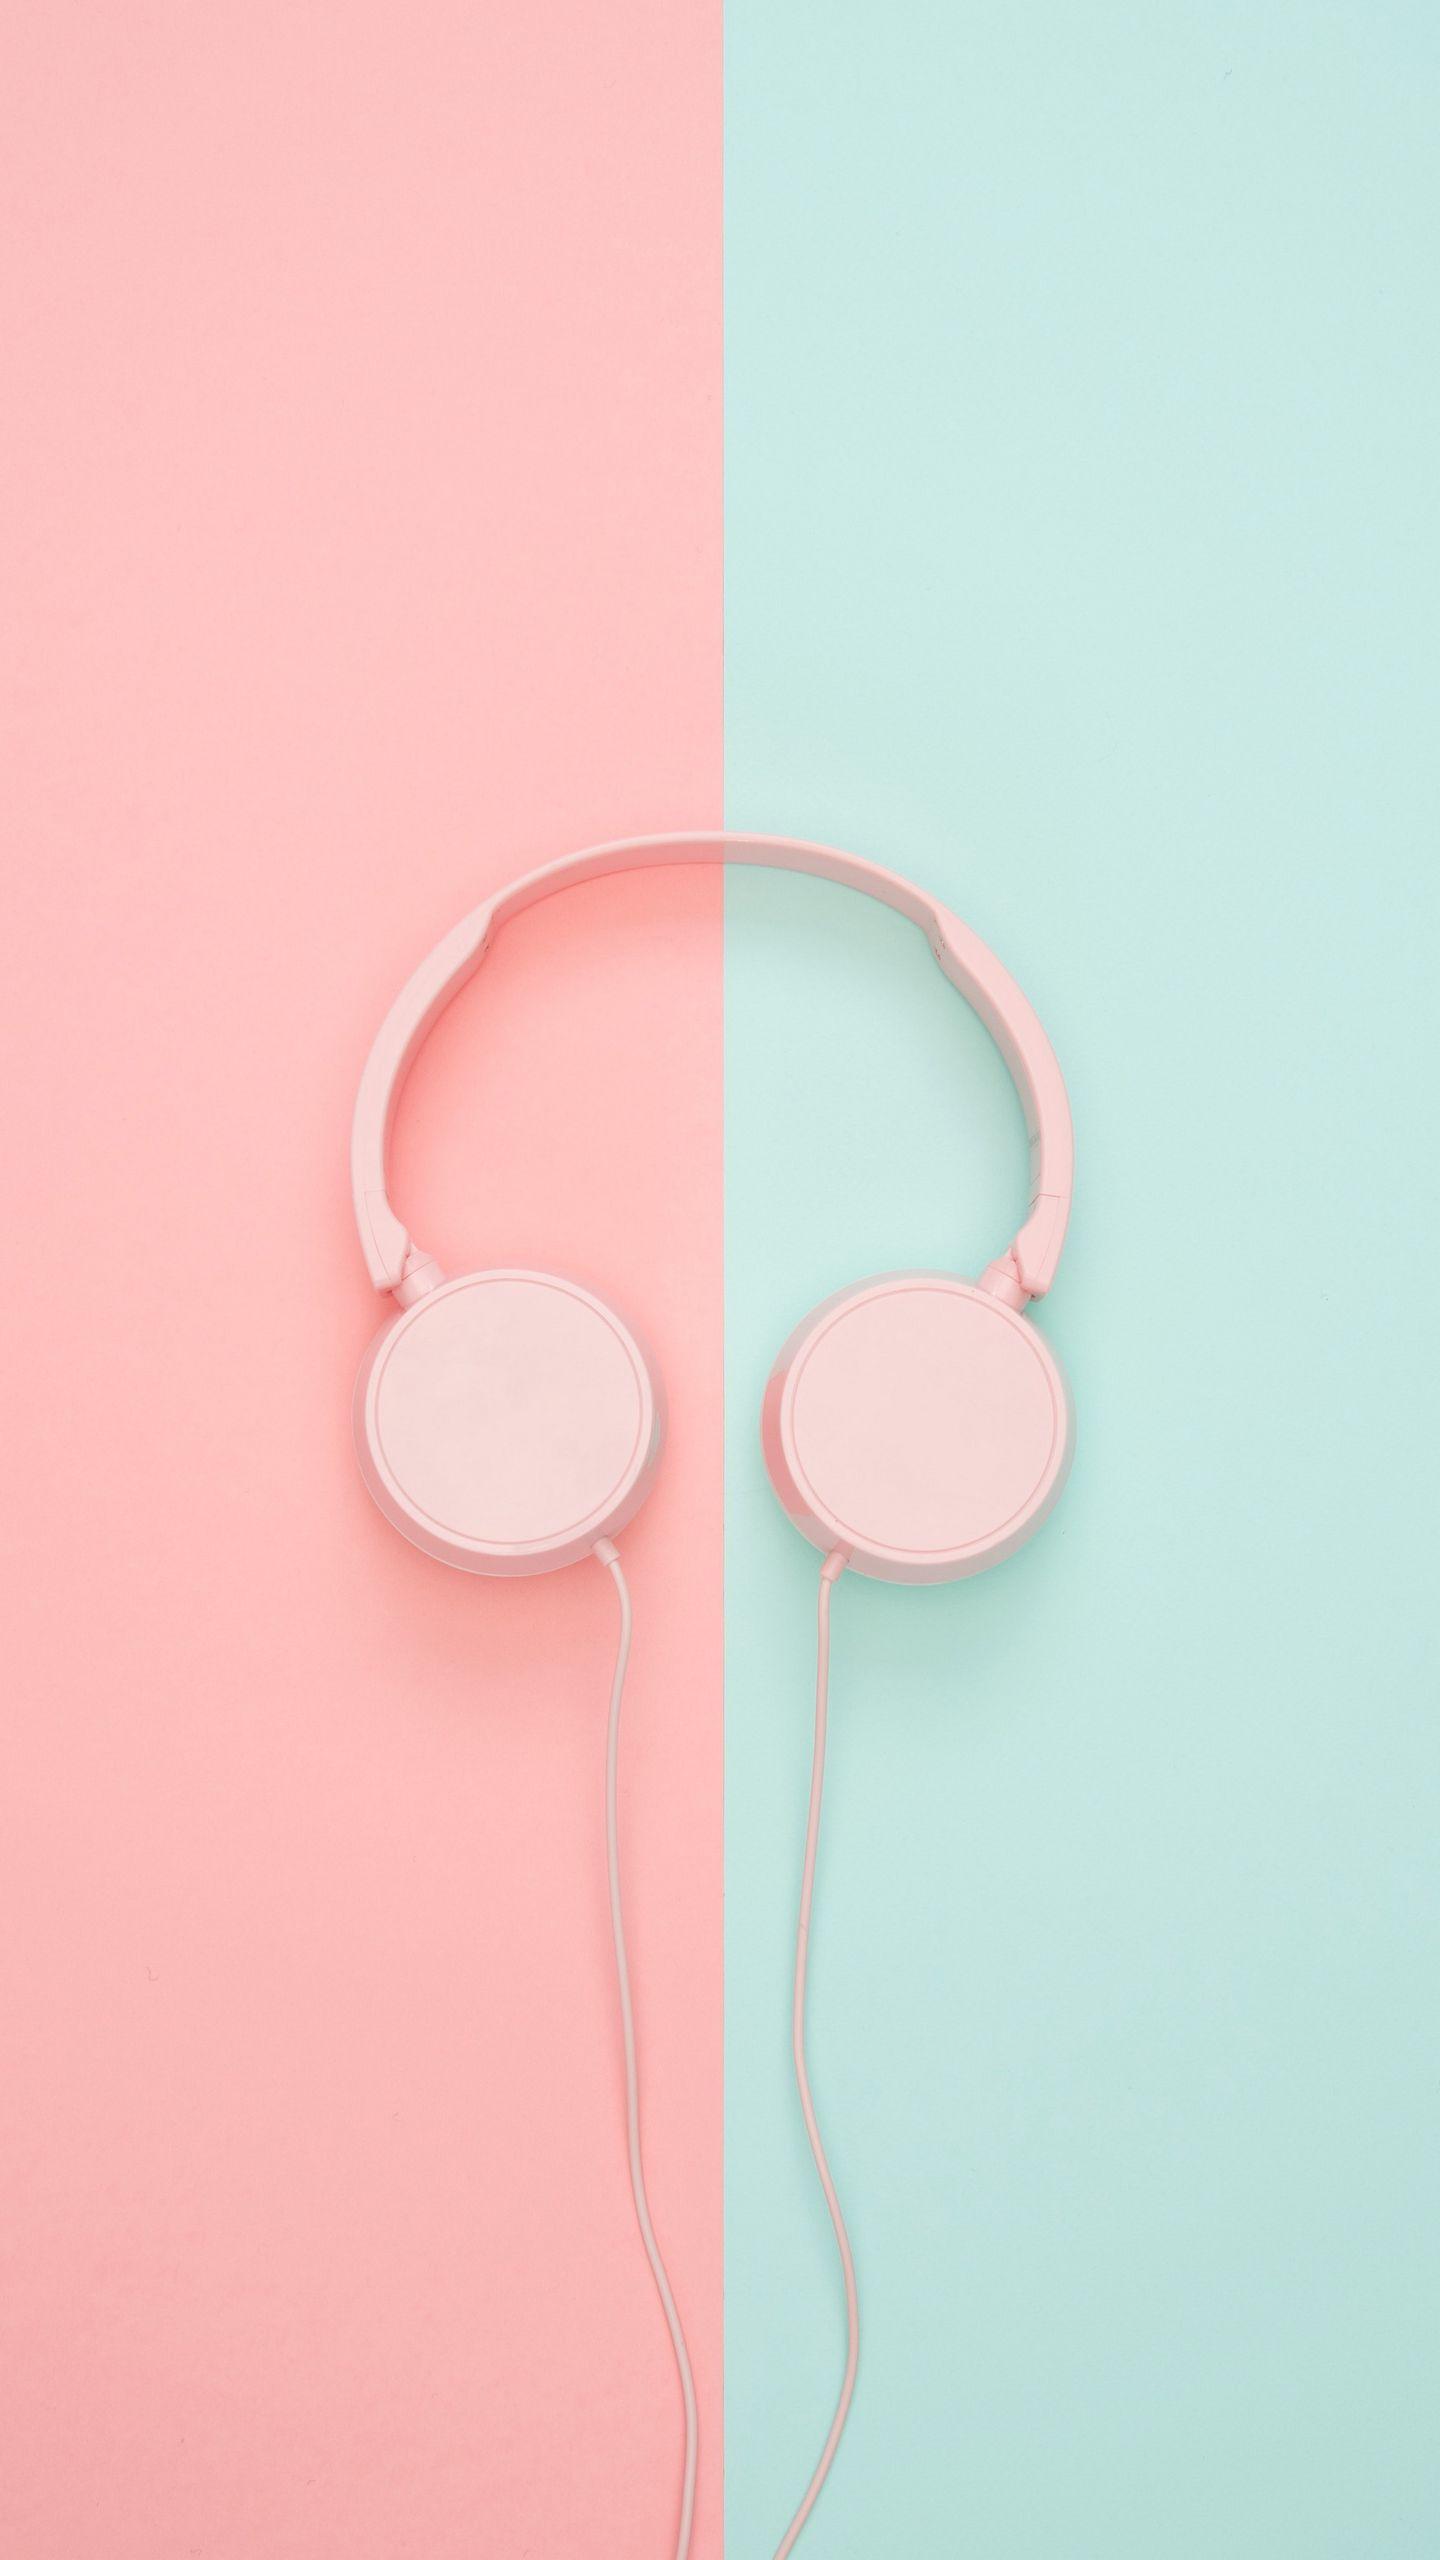 1440x2560 Wallpaper headphones, minimalism, pink, pastel